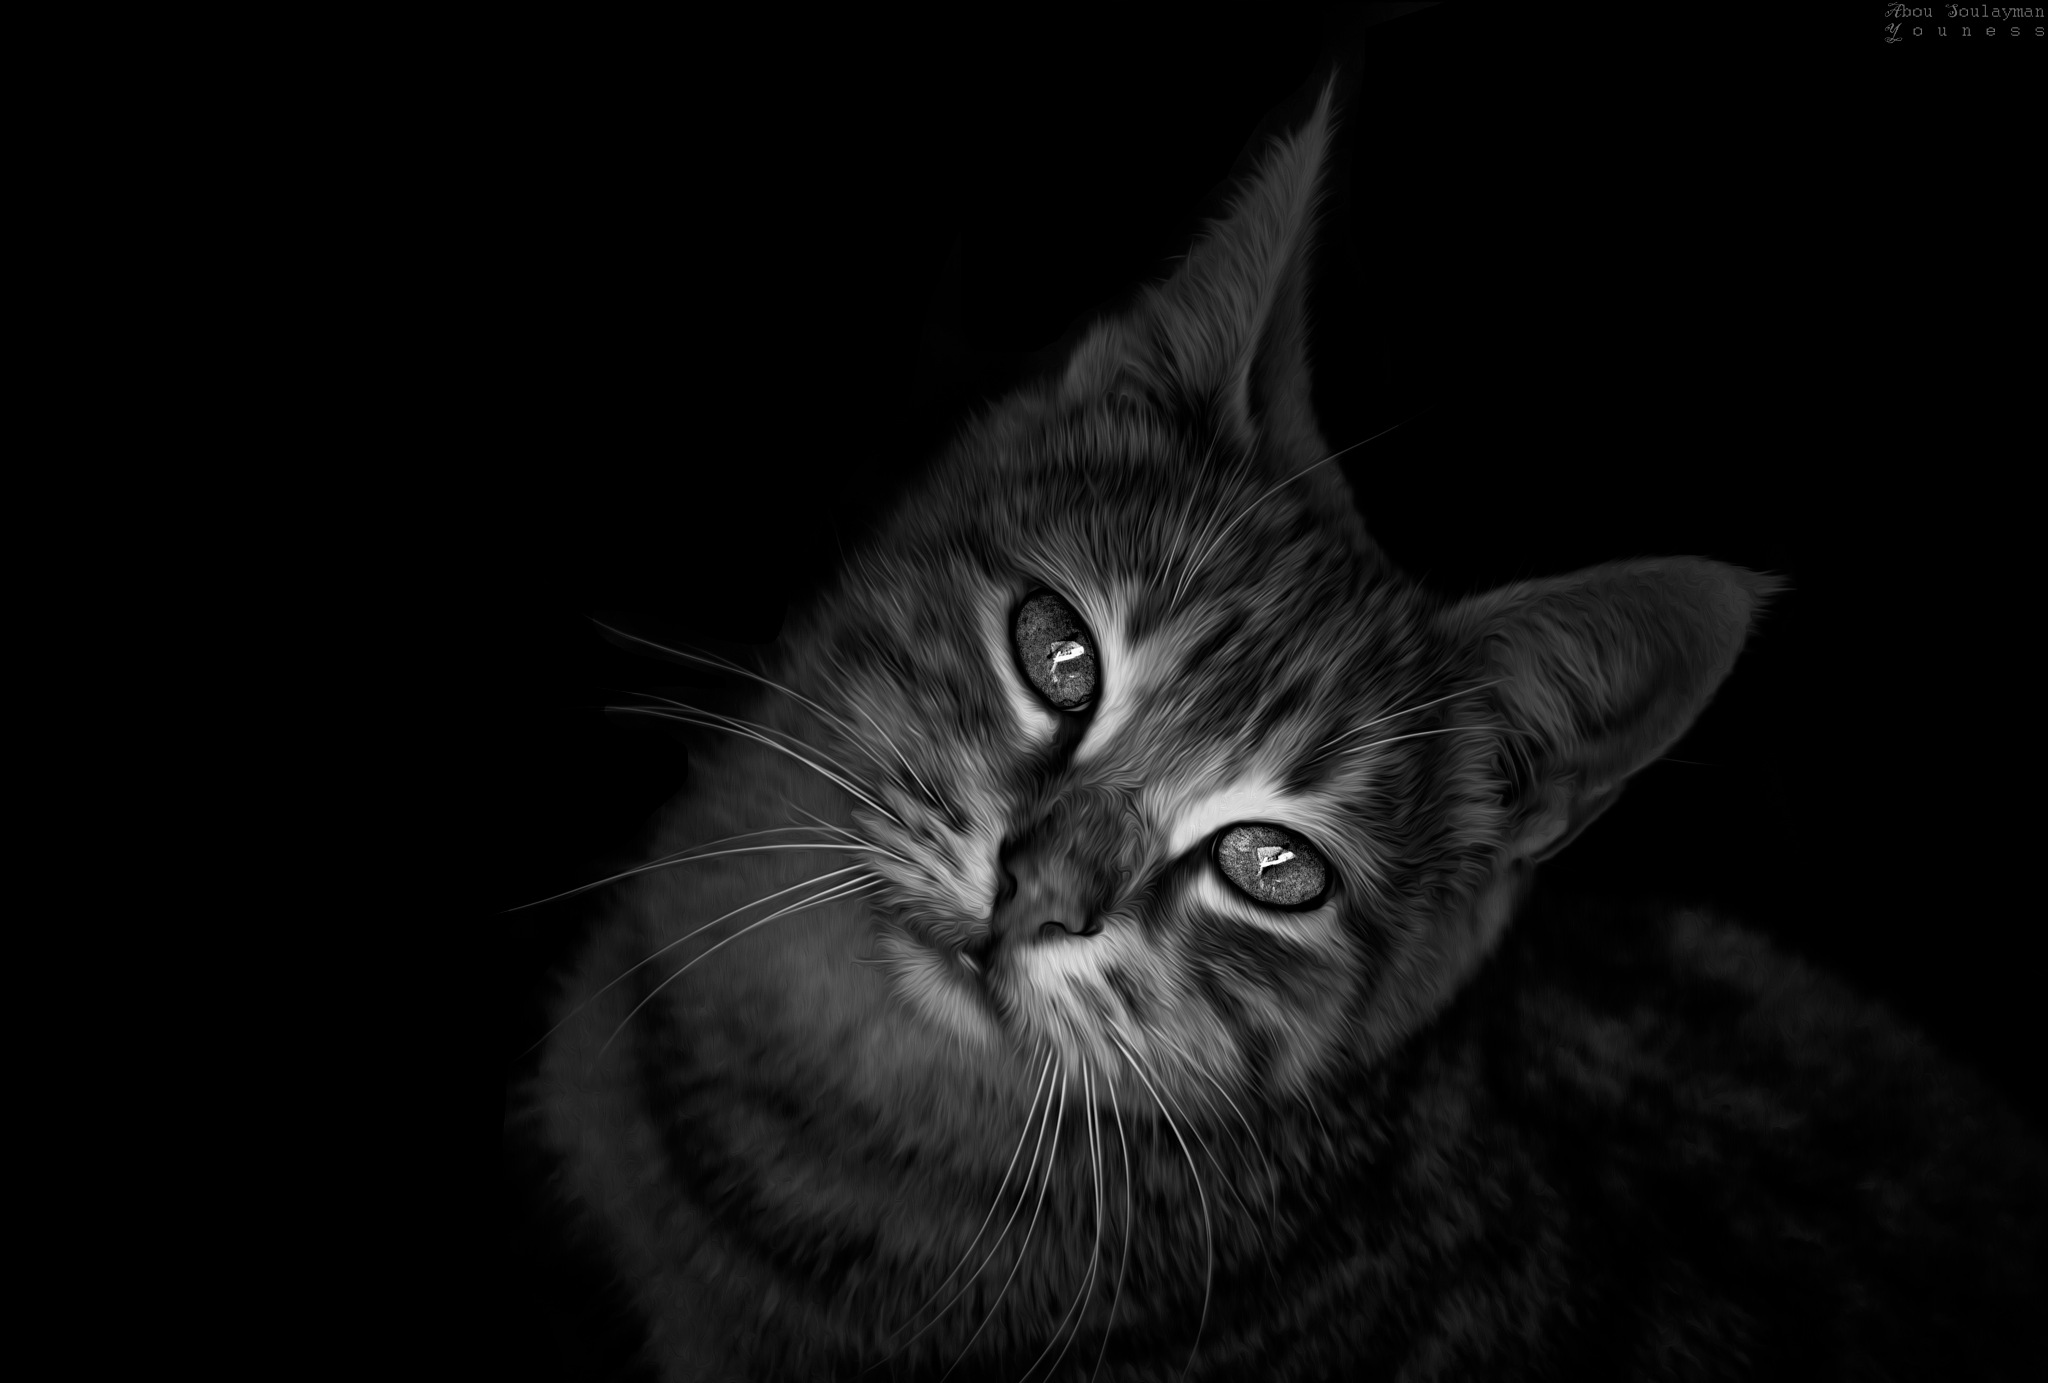 Sad cat by Errami Youness